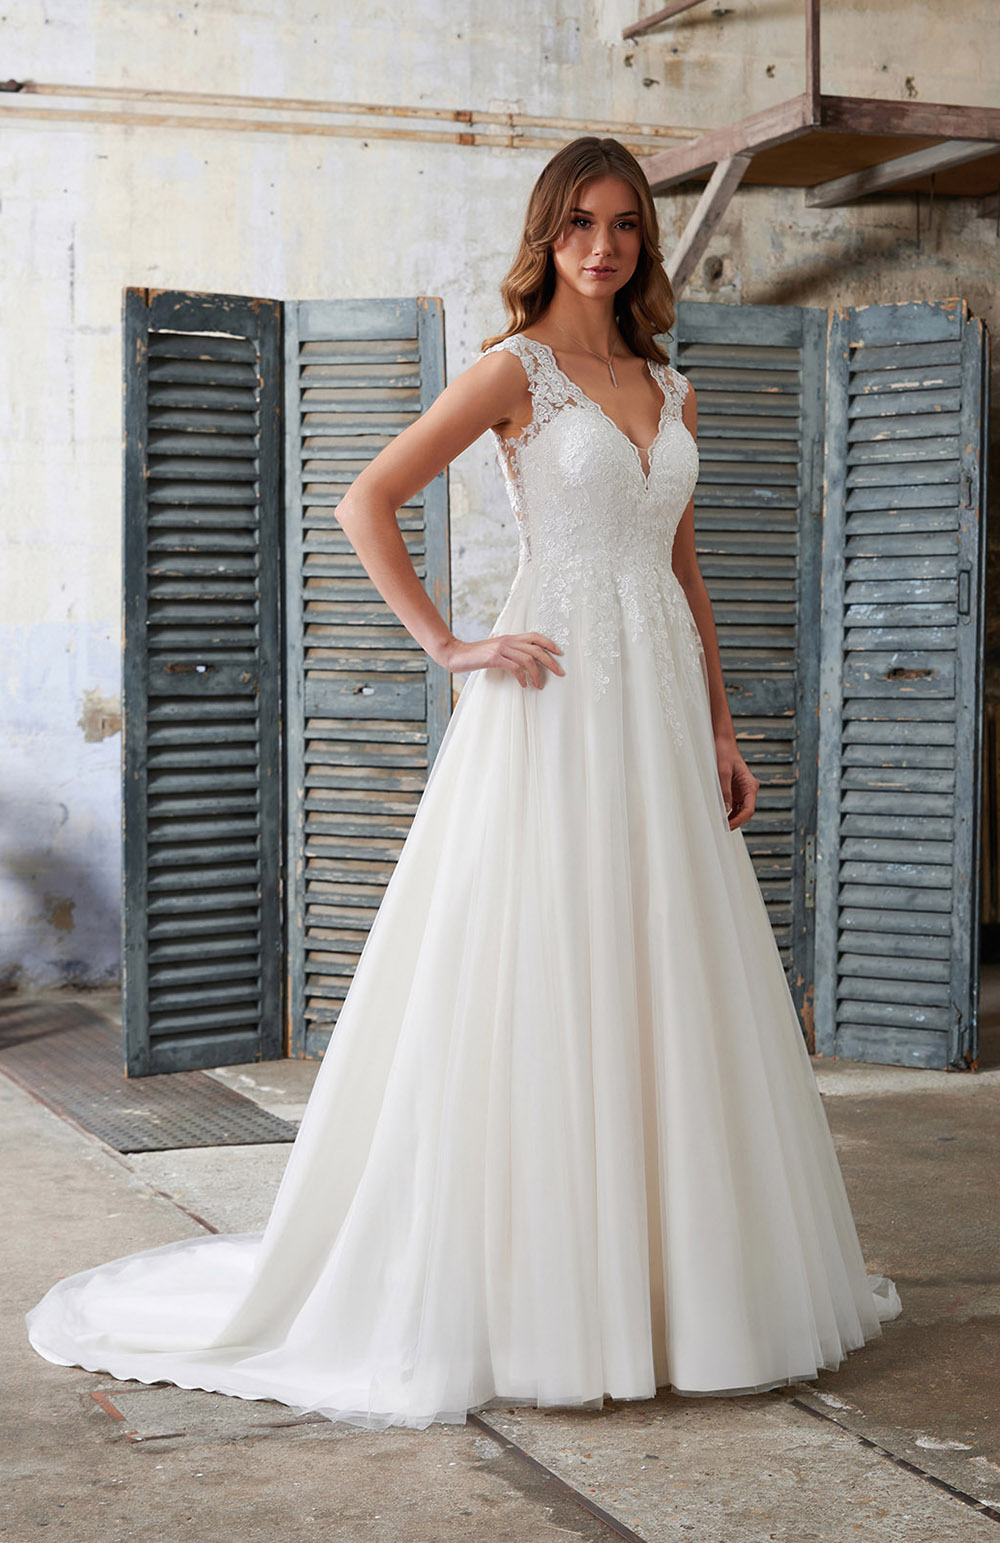 Robe de mariée Modèle Joane